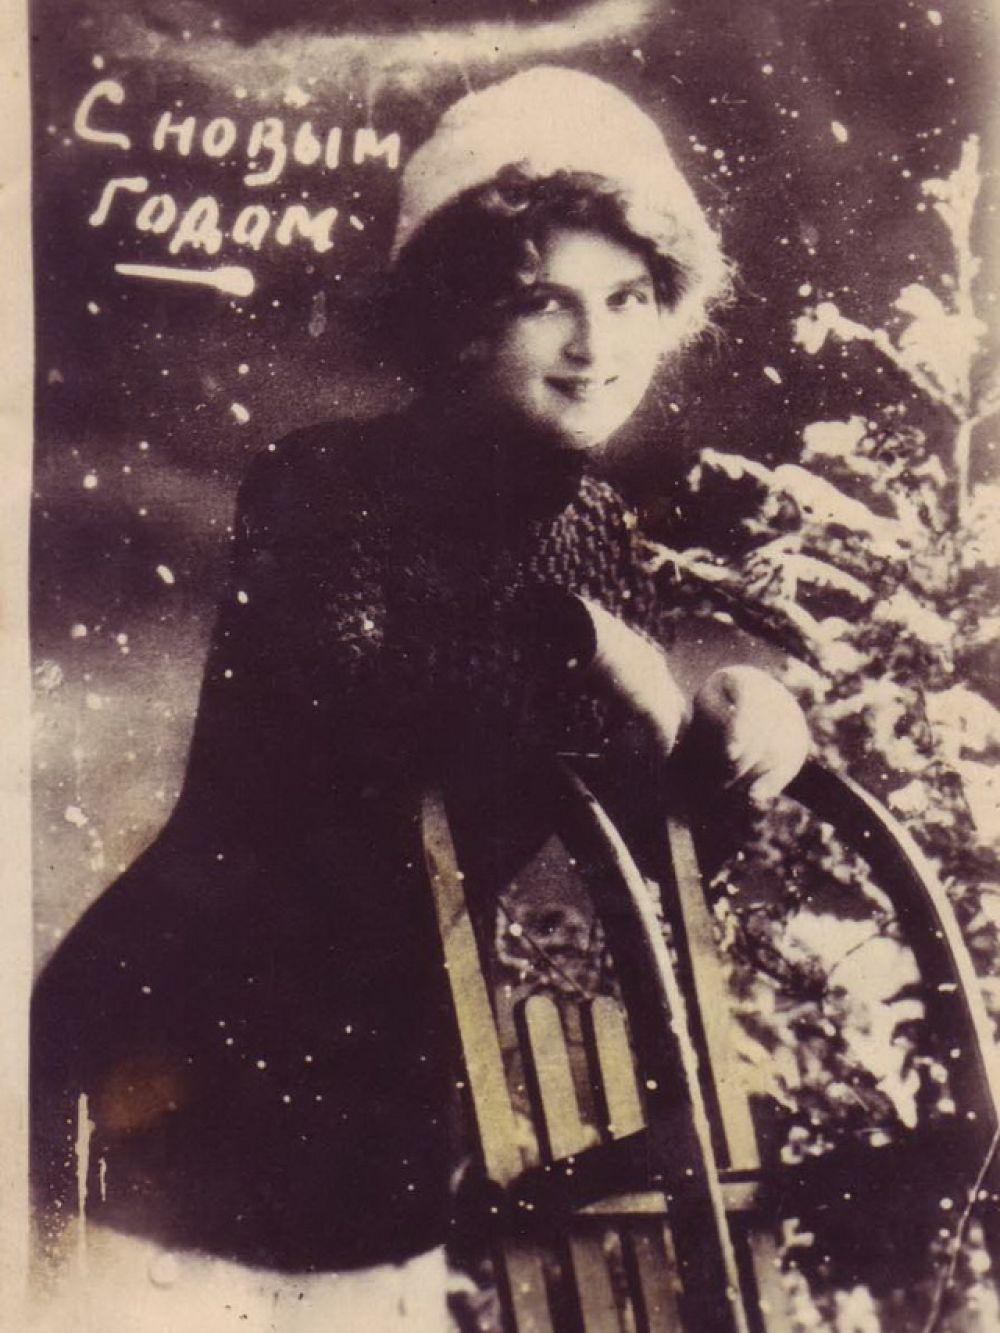 Новогодняя открытка 80-х.